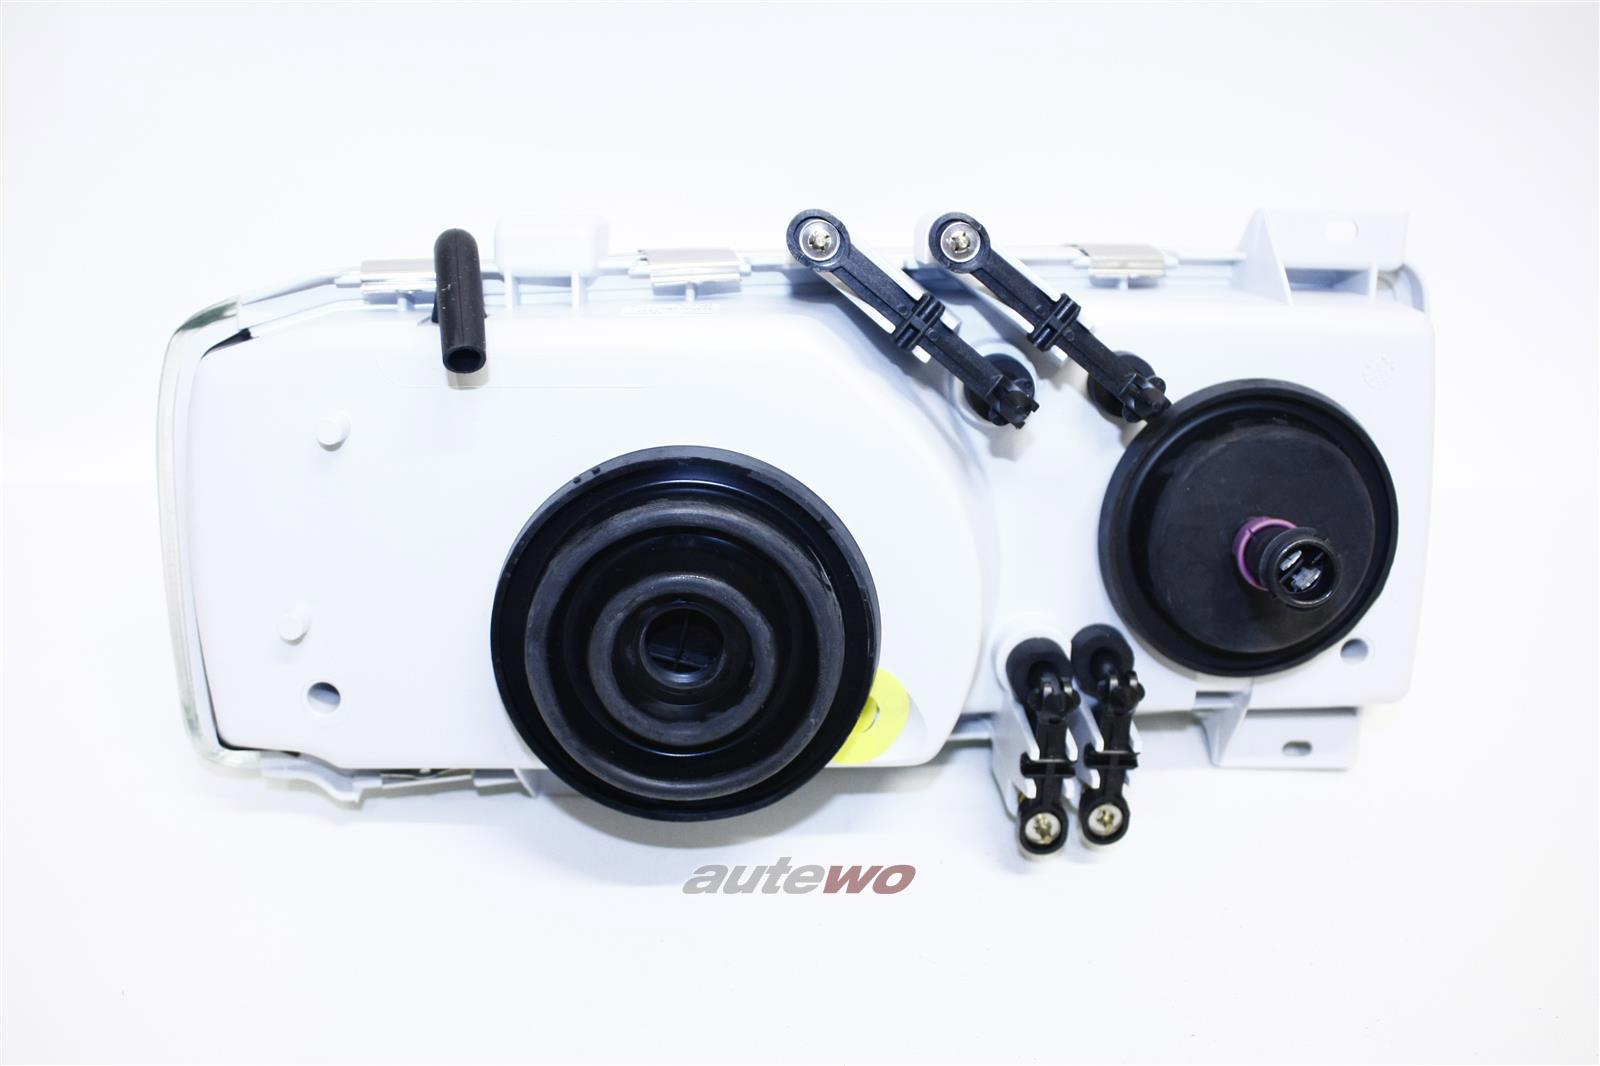 NEU&ORIGINAL Audi 90 Typ 81/85/Urquattro Scheinwerfer RHD Links 856941029A